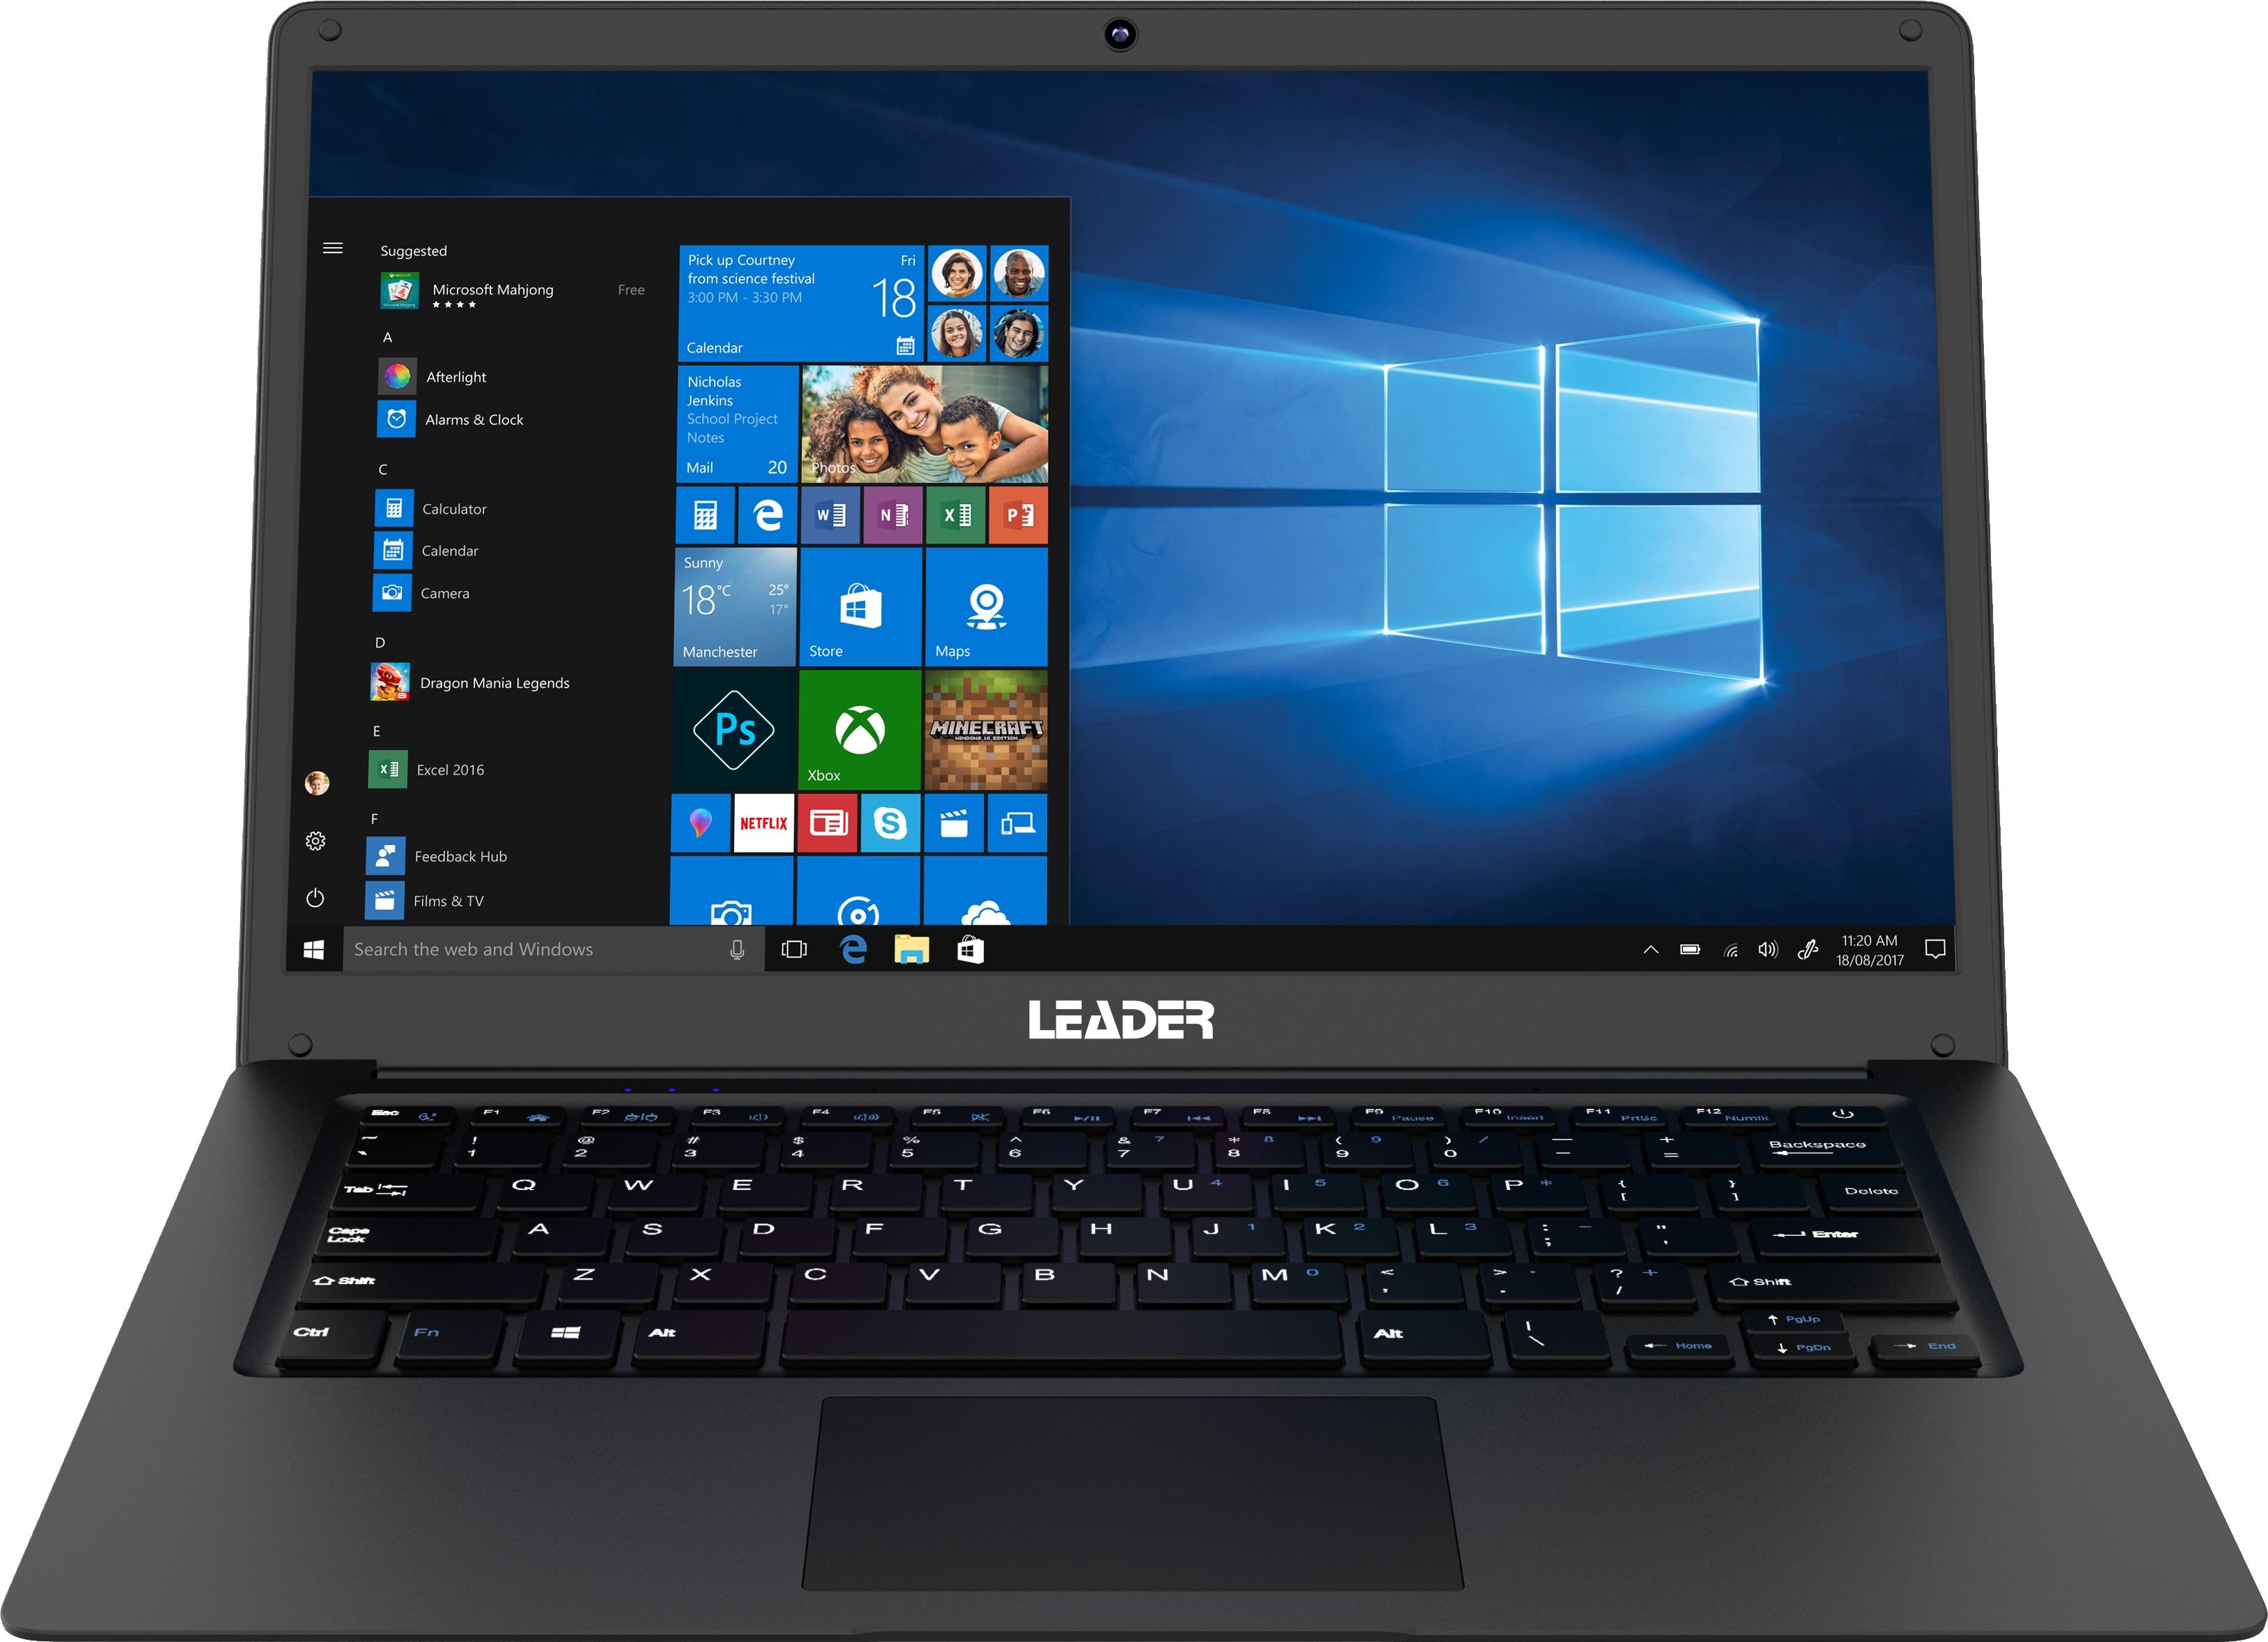 Leader Companion 409PRO Notebook, 14' Full HD, Celeron, 4GB, 64GB + 240GB SSD, Windows 10 Professional, 1 Year Onsite Warranty, Webcam, W10P